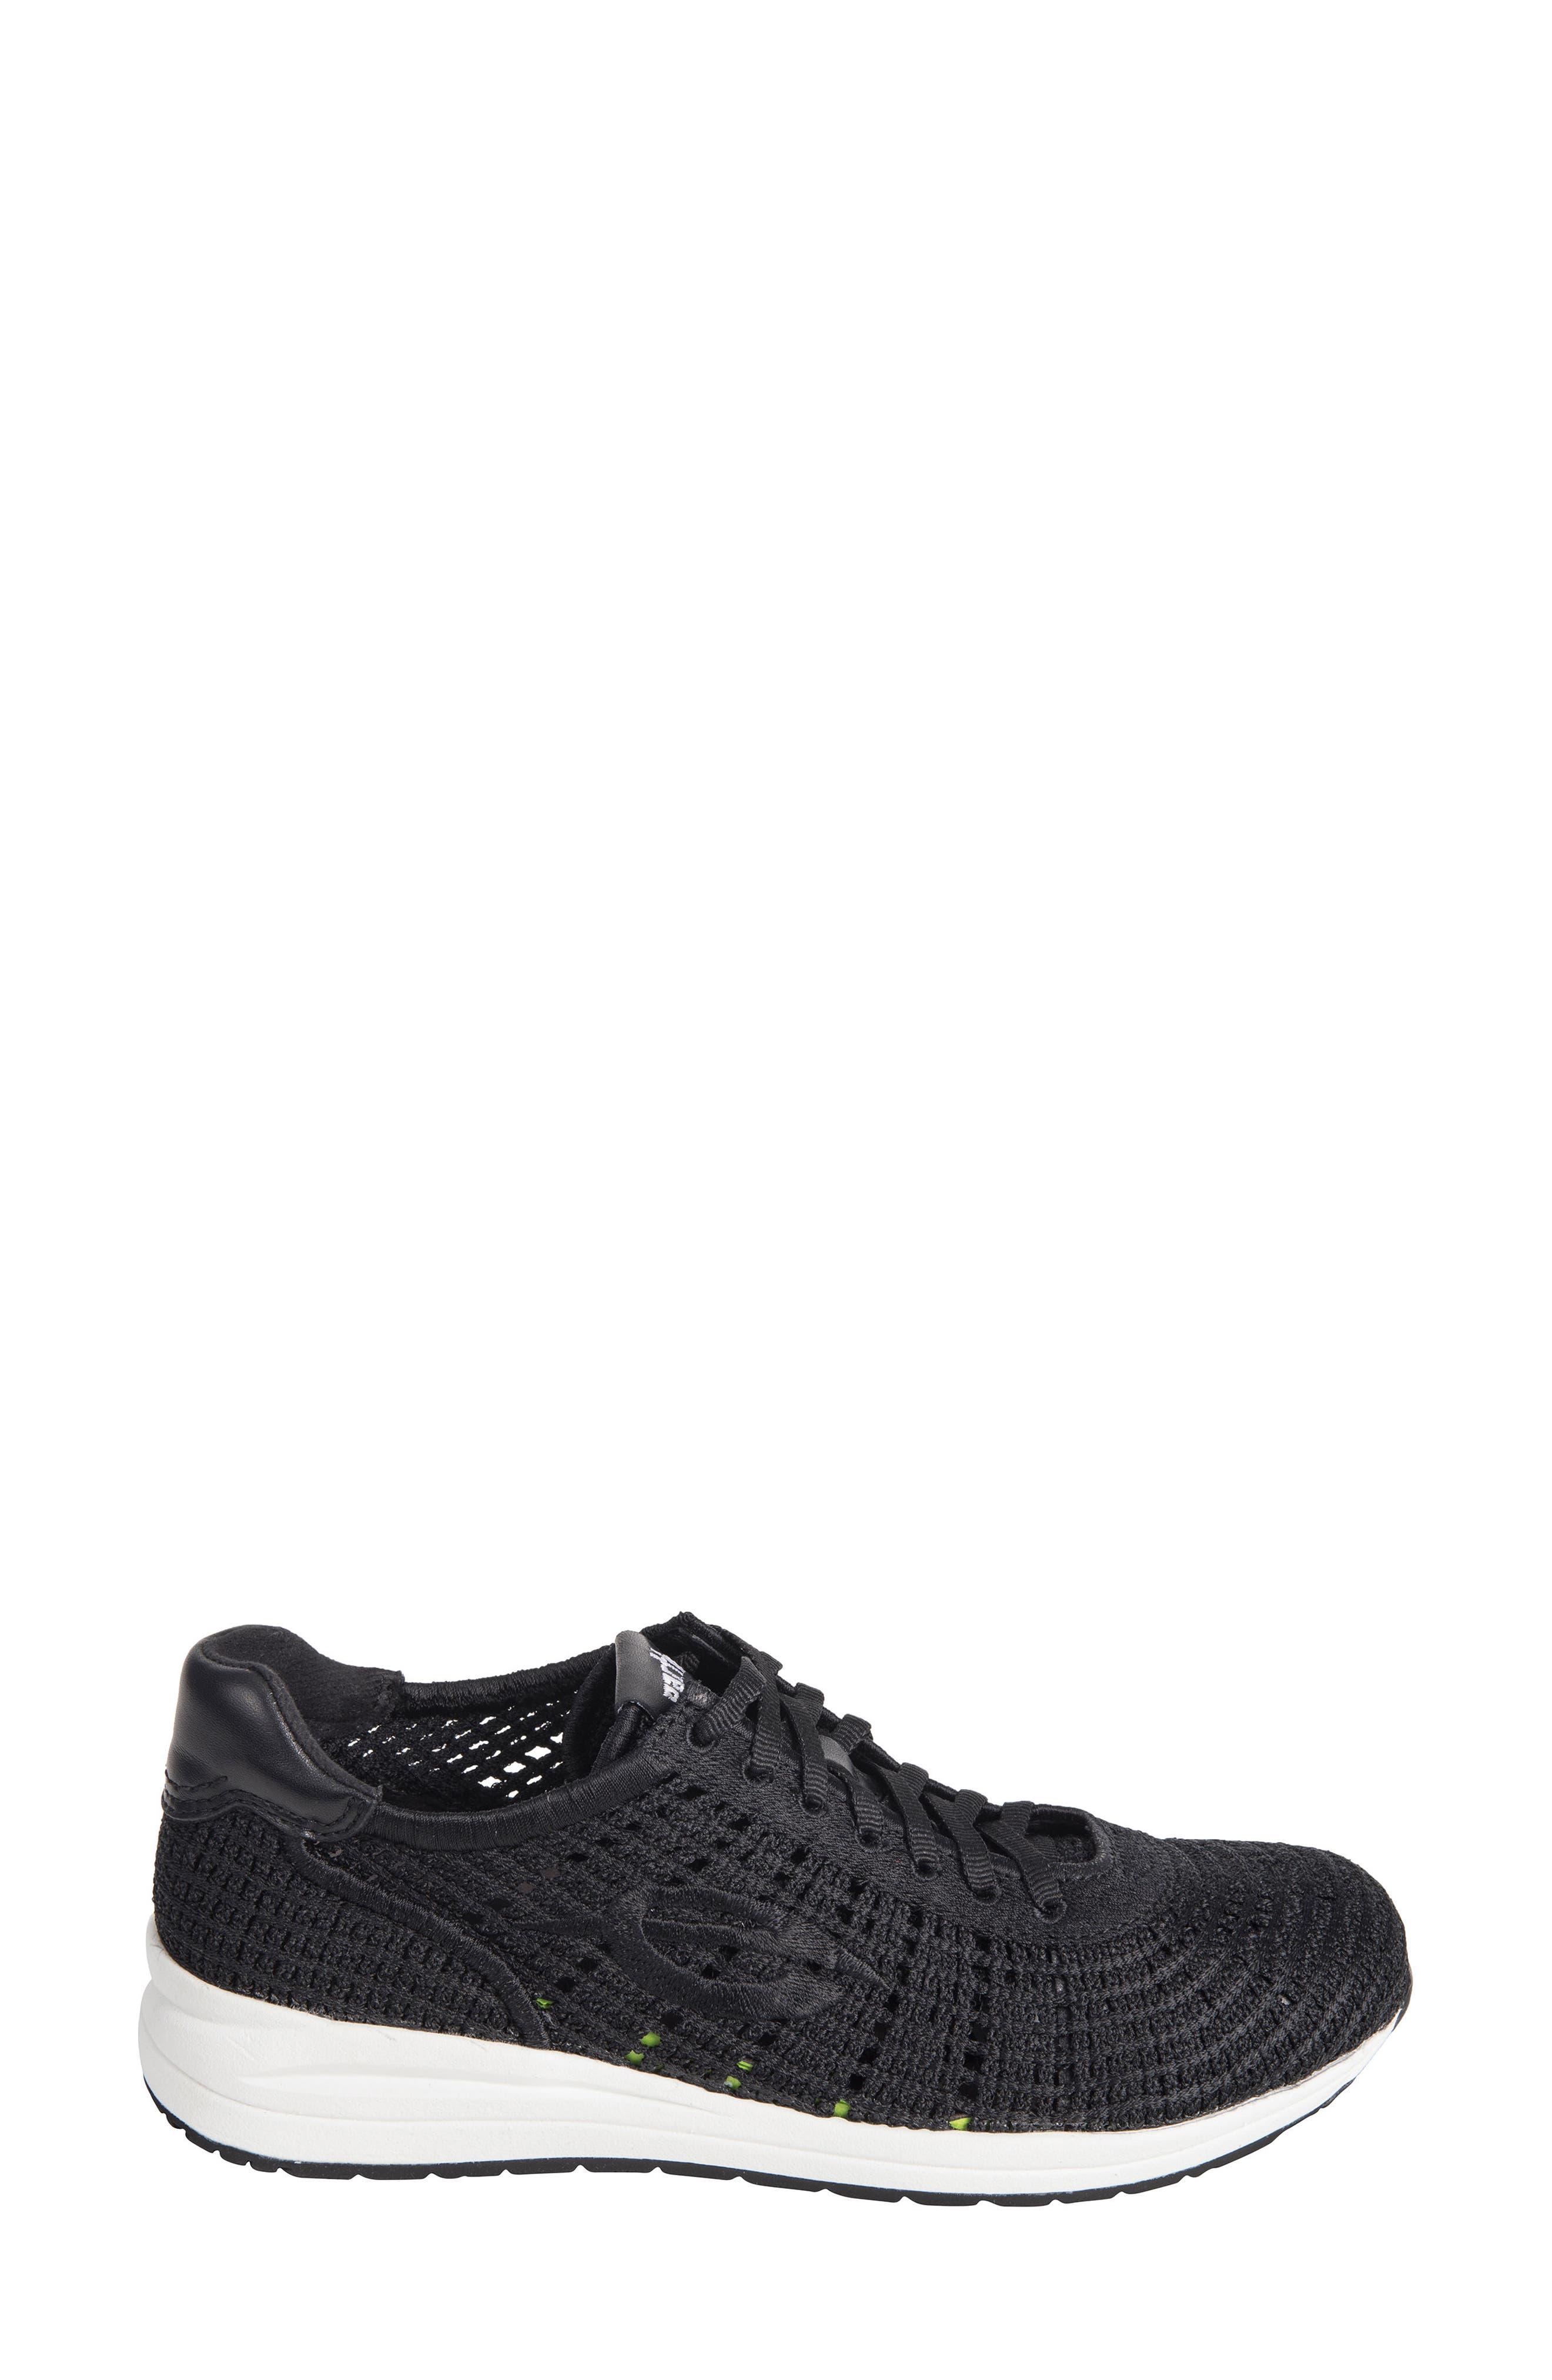 Earth Vital Sneaker,                             Alternate thumbnail 3, color,                             Black